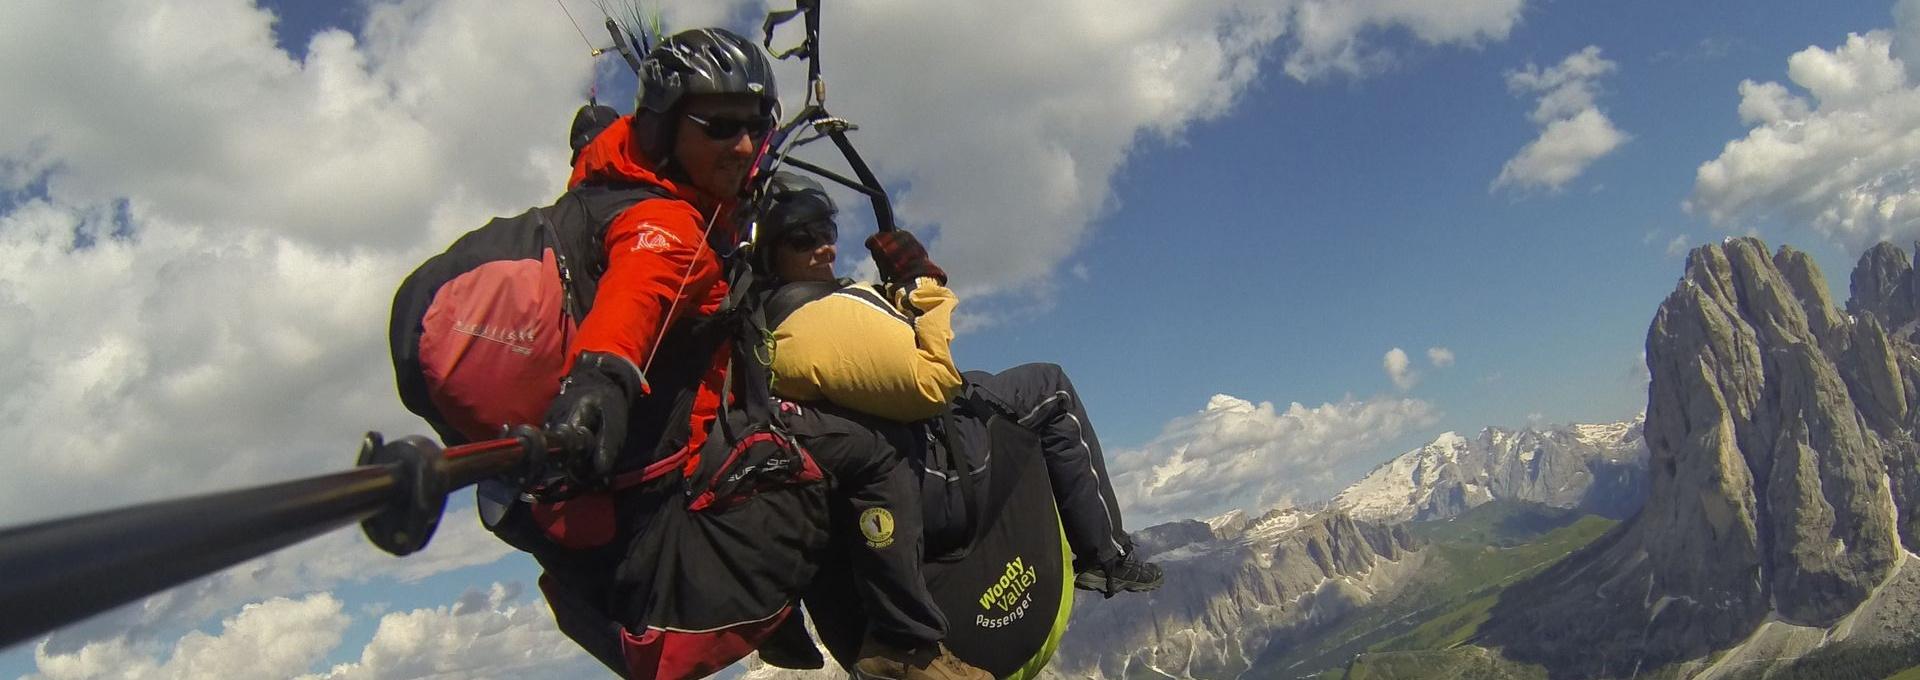 Val Gardena - Dolomites paragliding